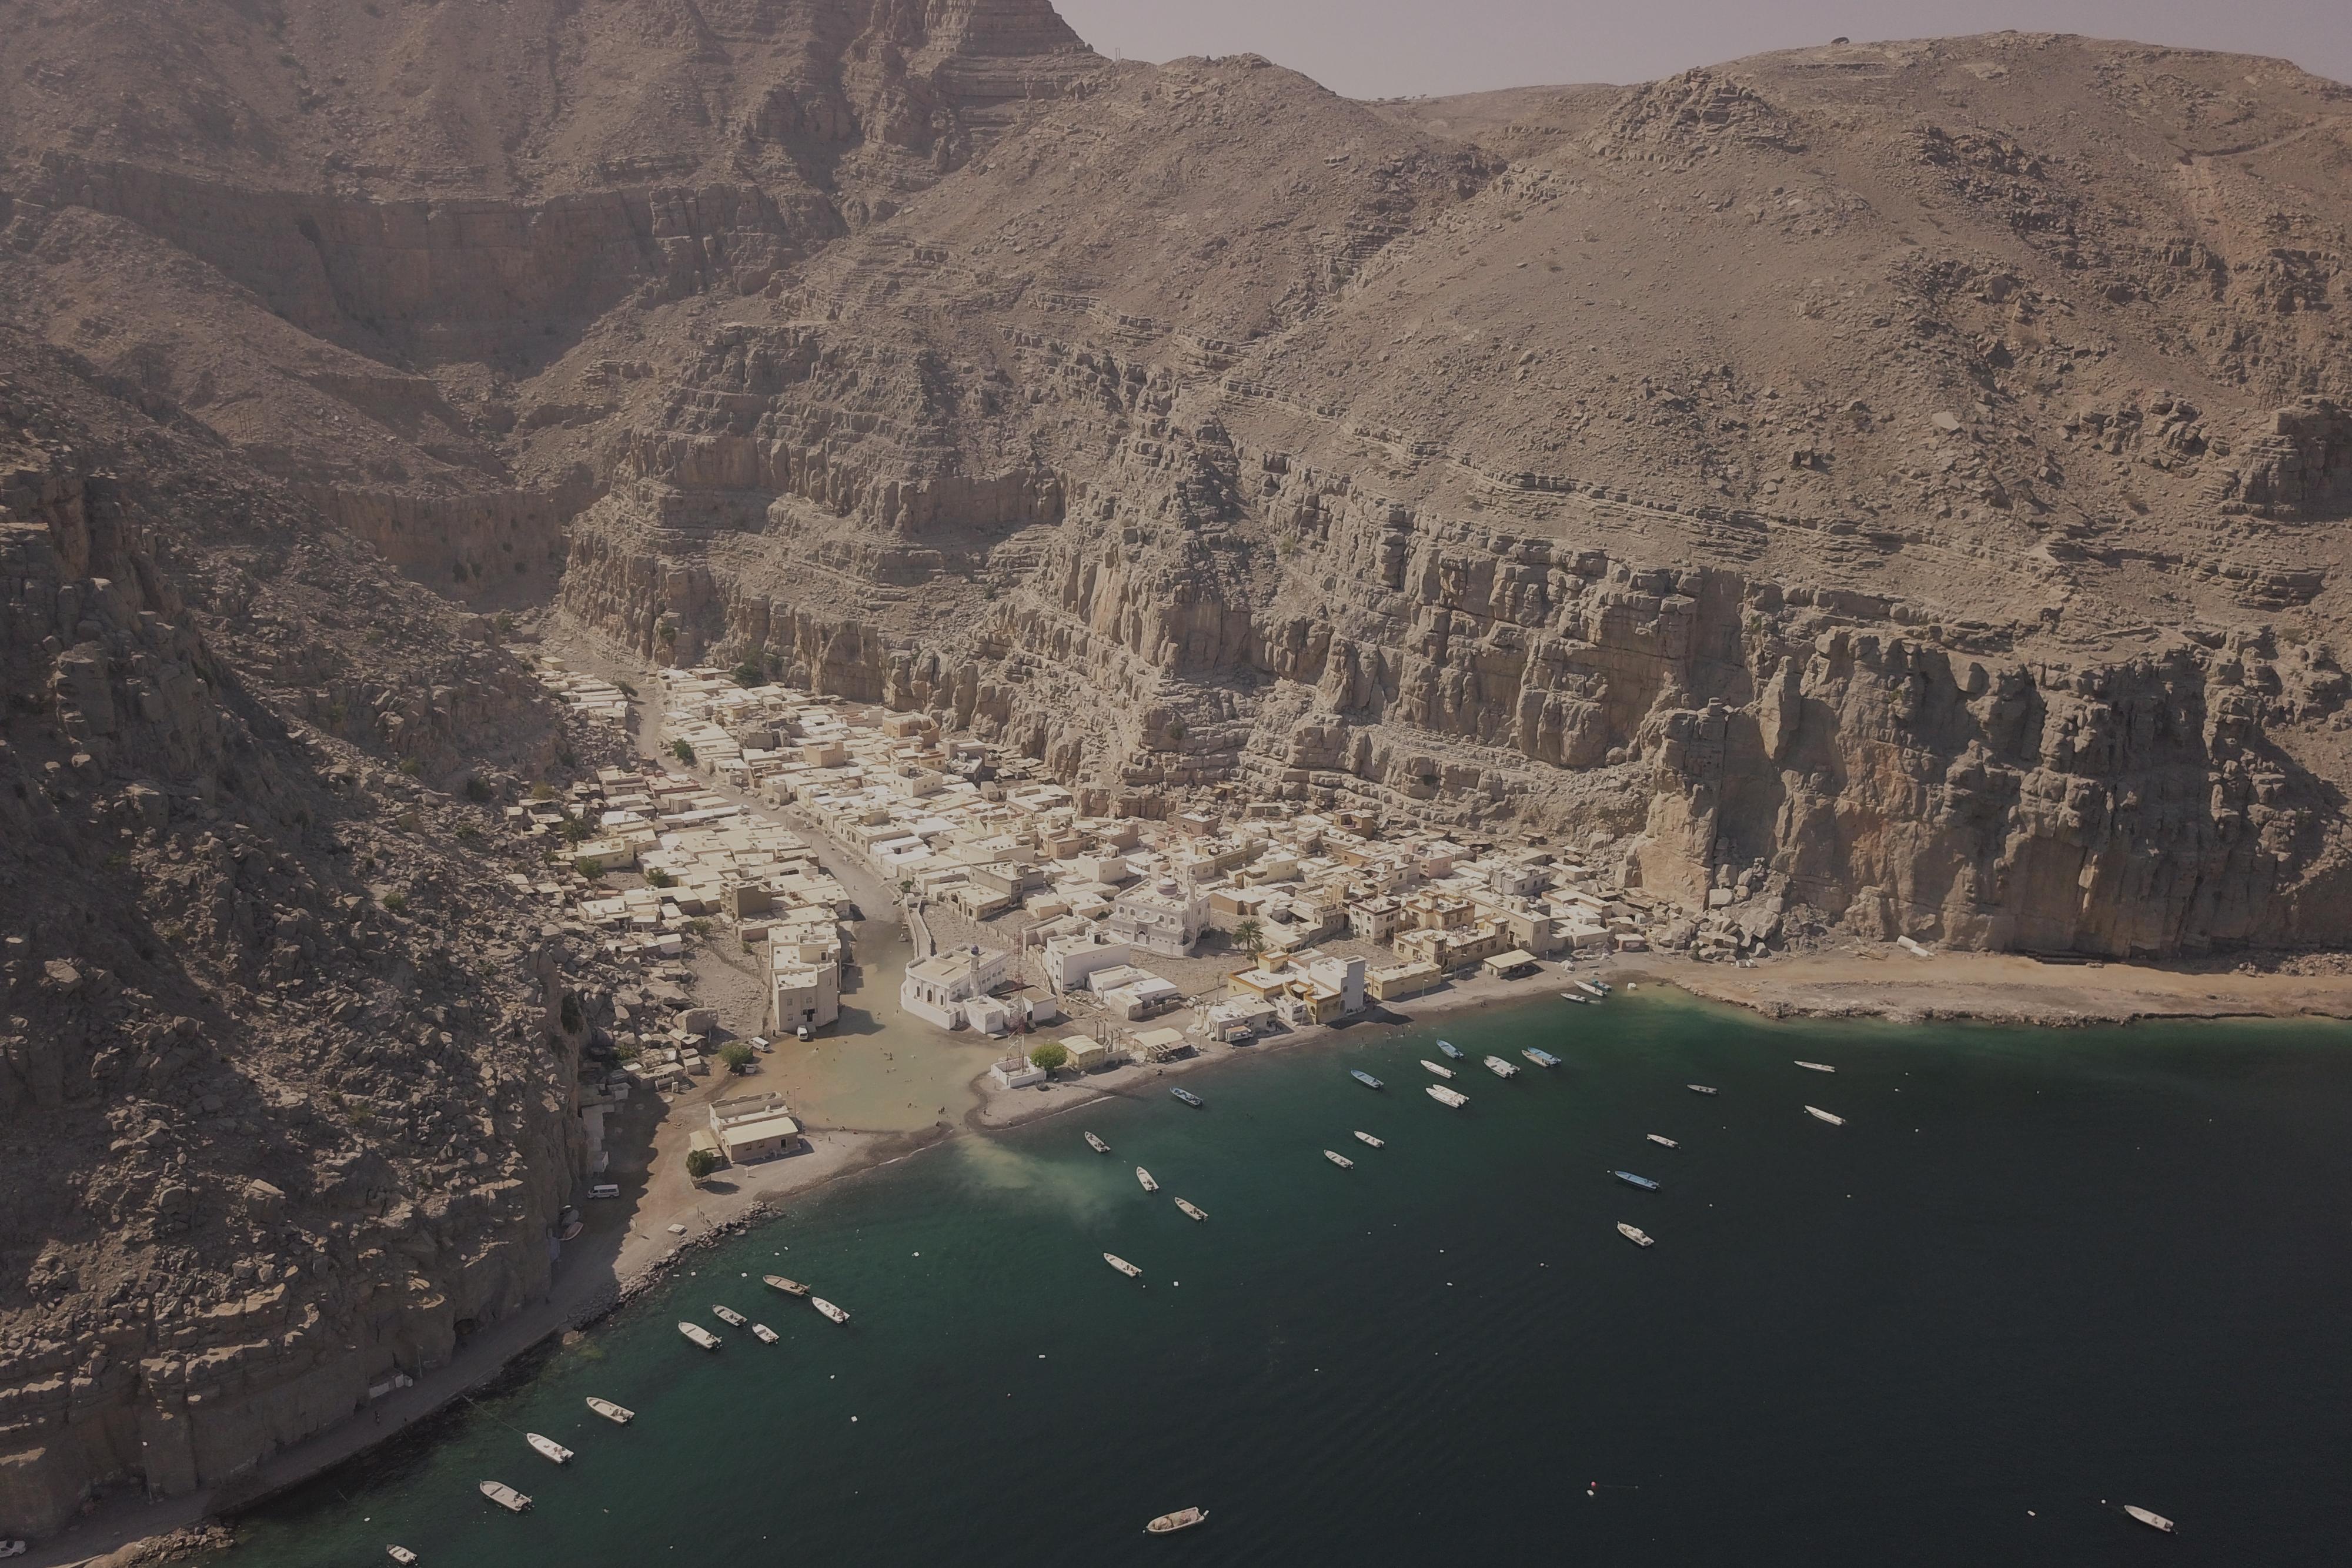 Kumzar Village Oman drone 2019